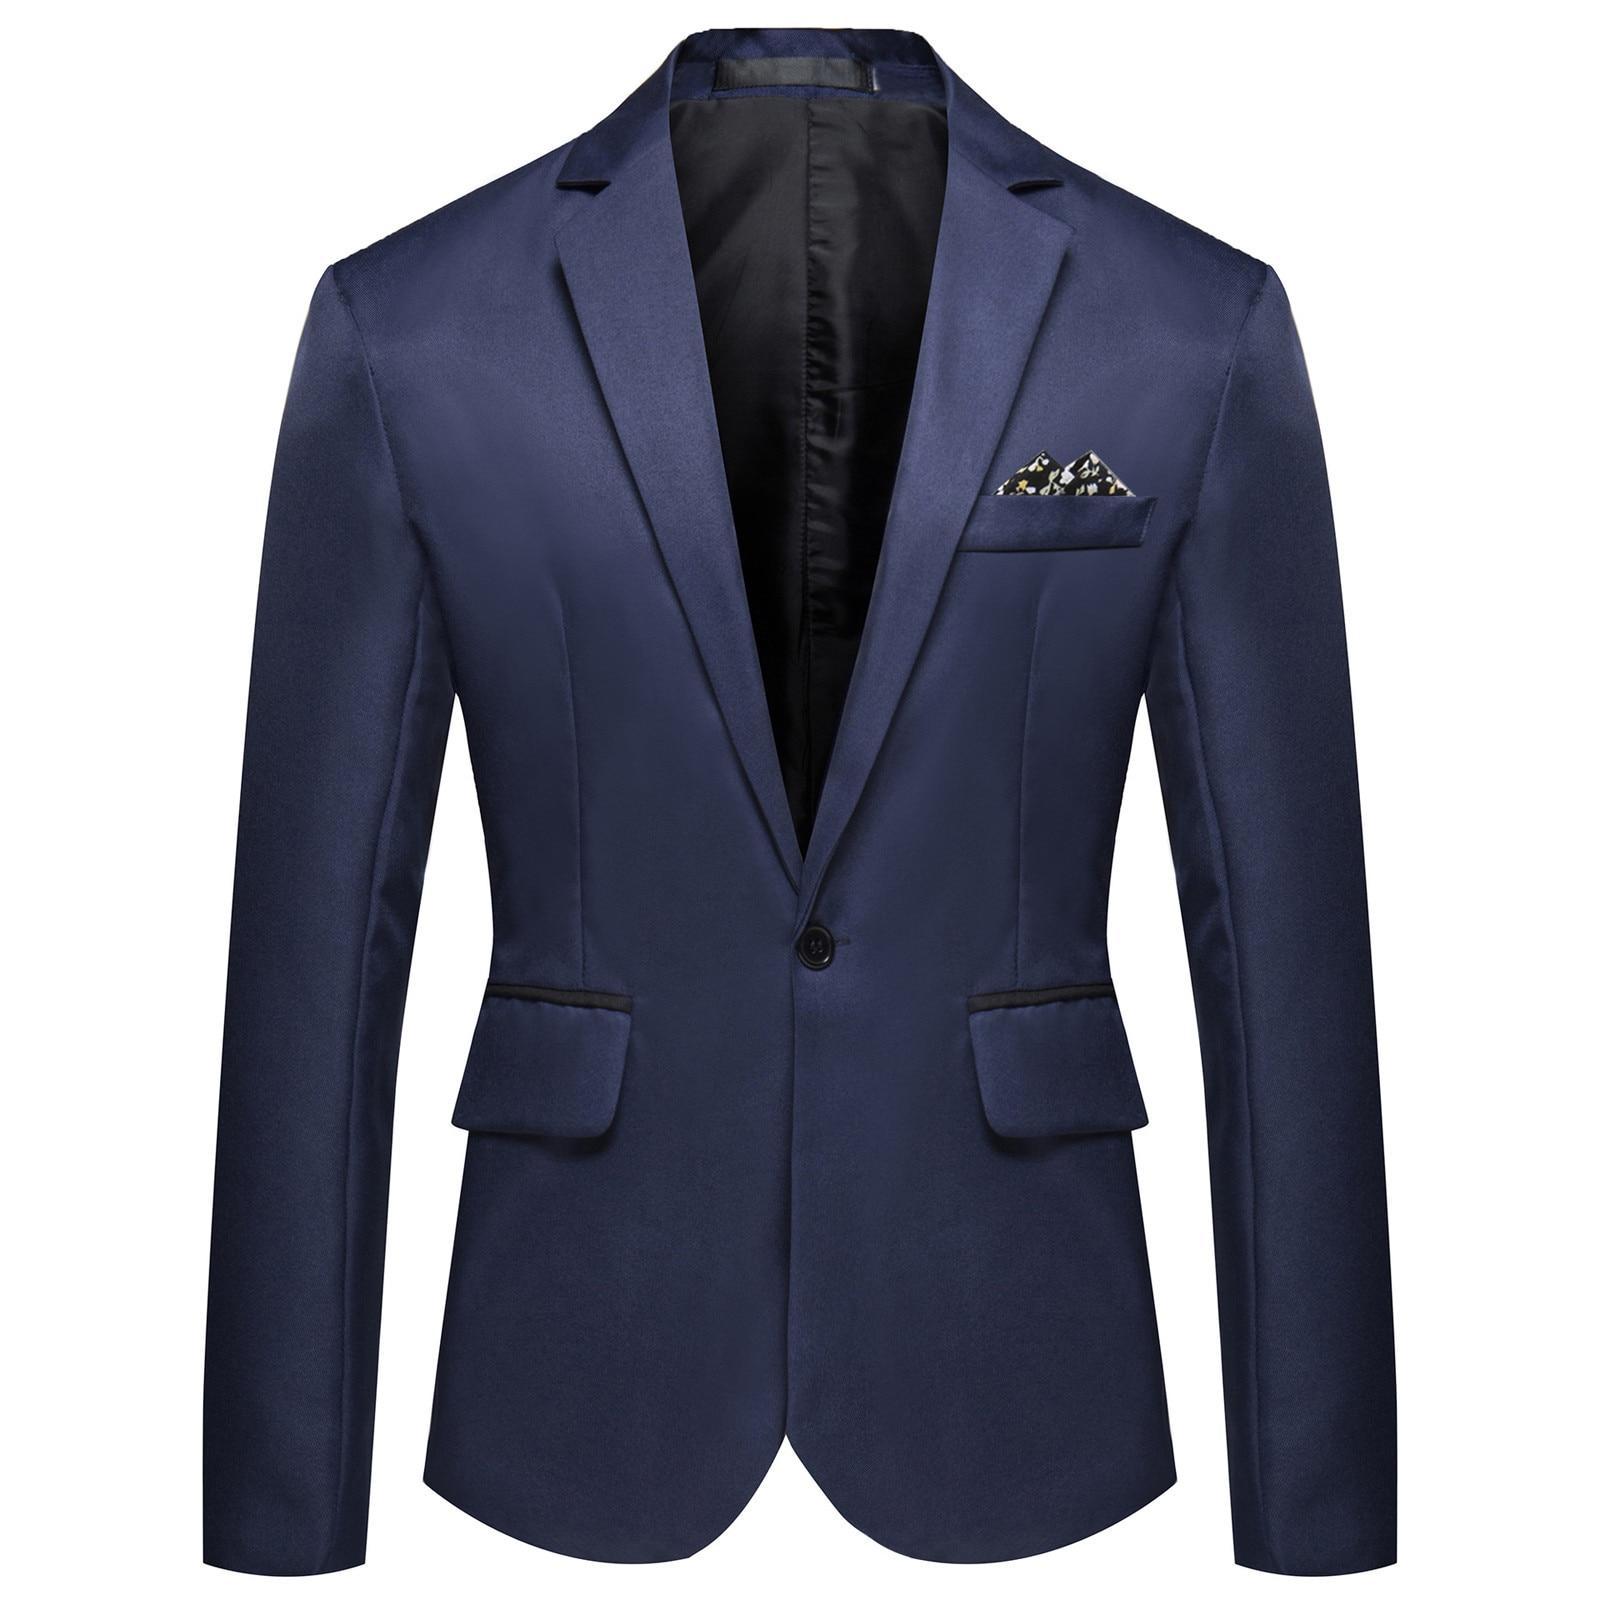 Male Suit Coat Slim Fit Office Blazer-Jackets Fashion Men's Casual Business Wedding Long Sleeve Butt